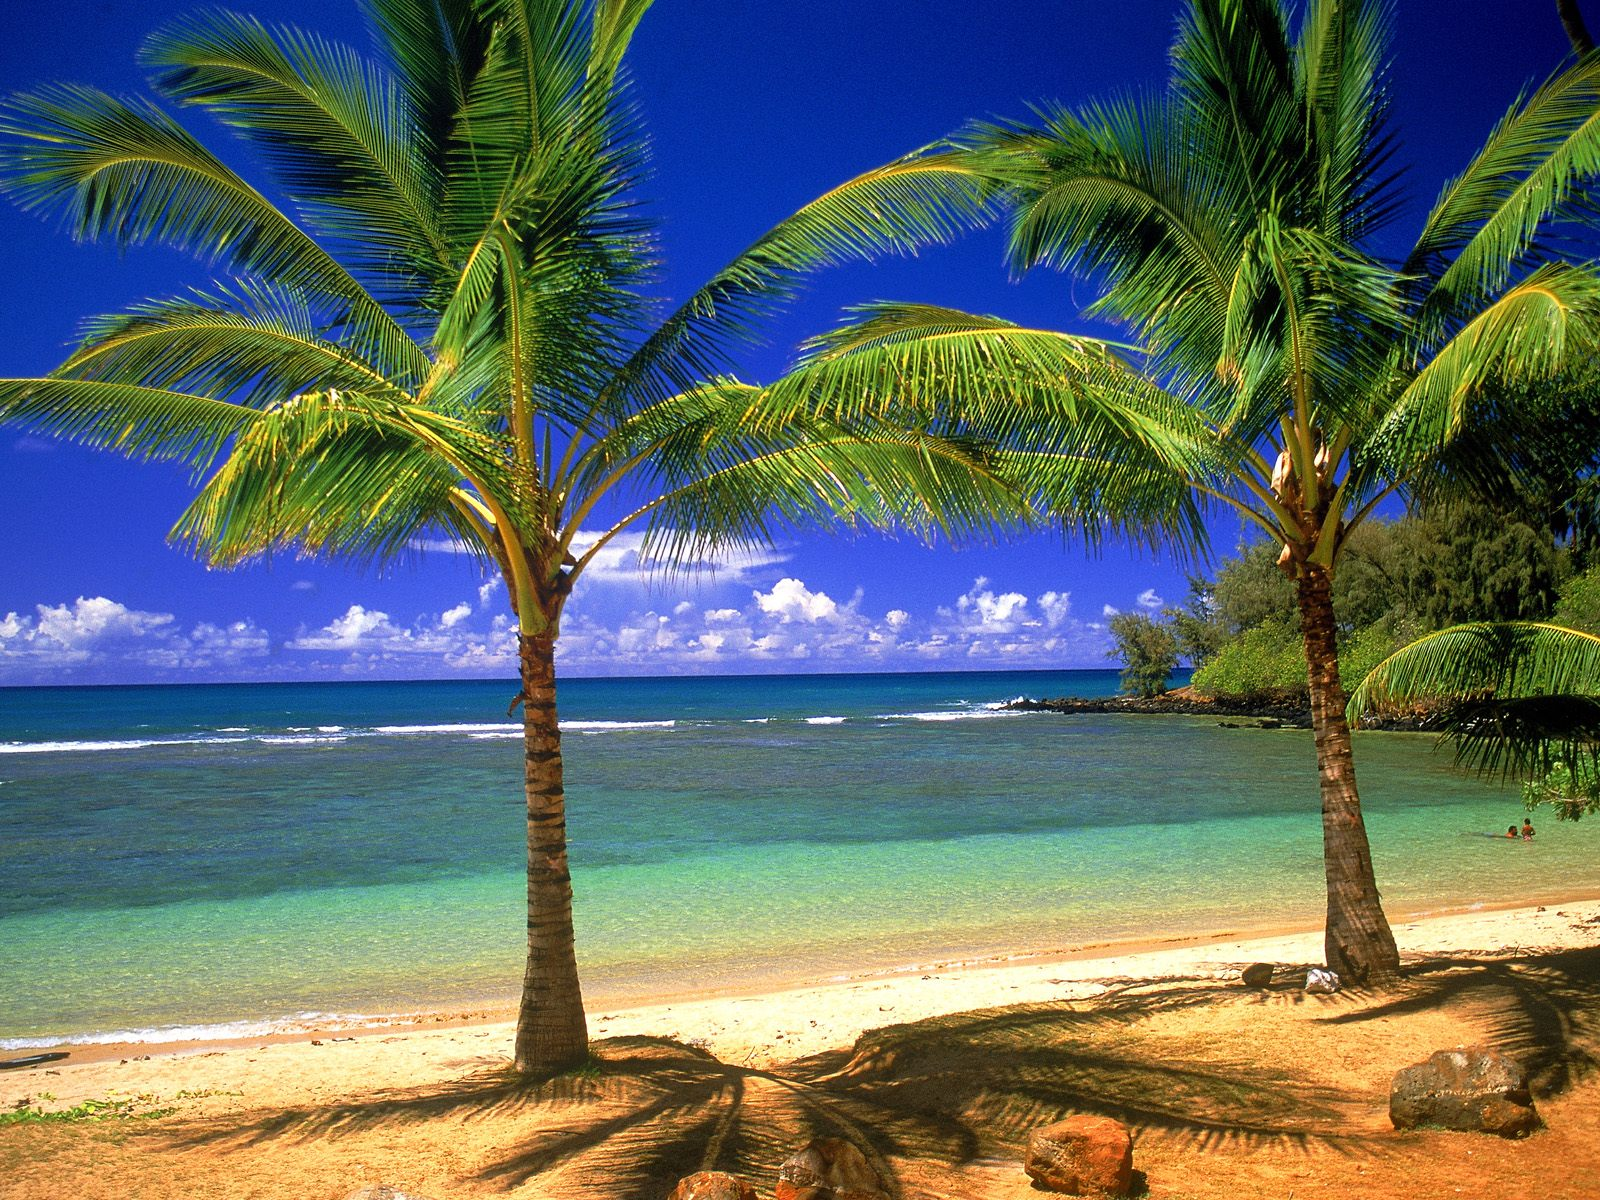 Tropical Lagoon Canada Photography Desktop Wallpapers 6505 Views 1600x1200